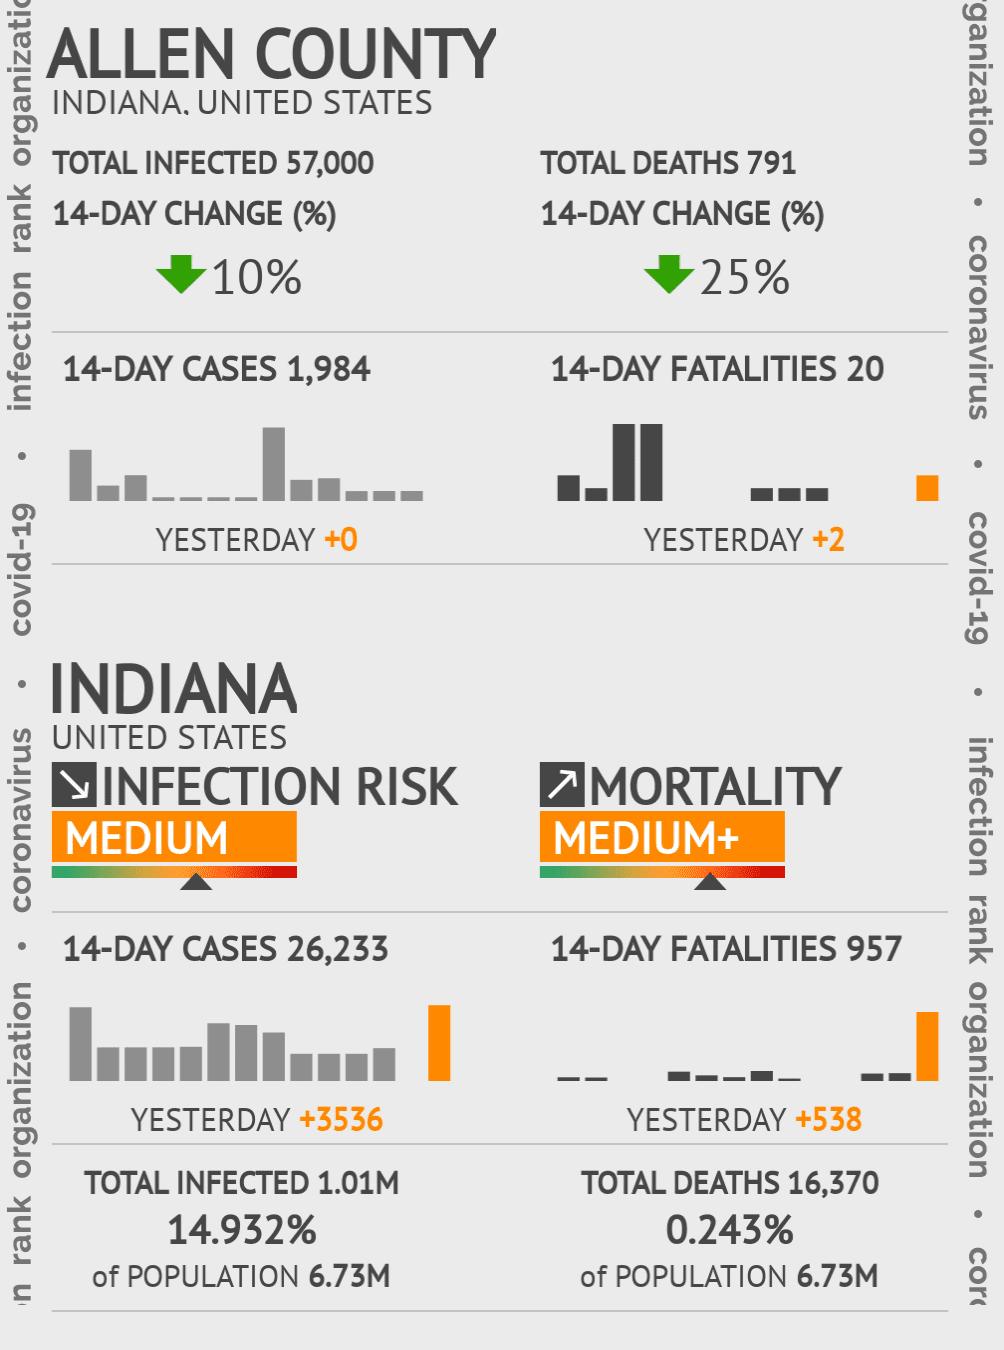 Allen County Coronavirus Covid-19 Risk of Infection on February 28, 2021